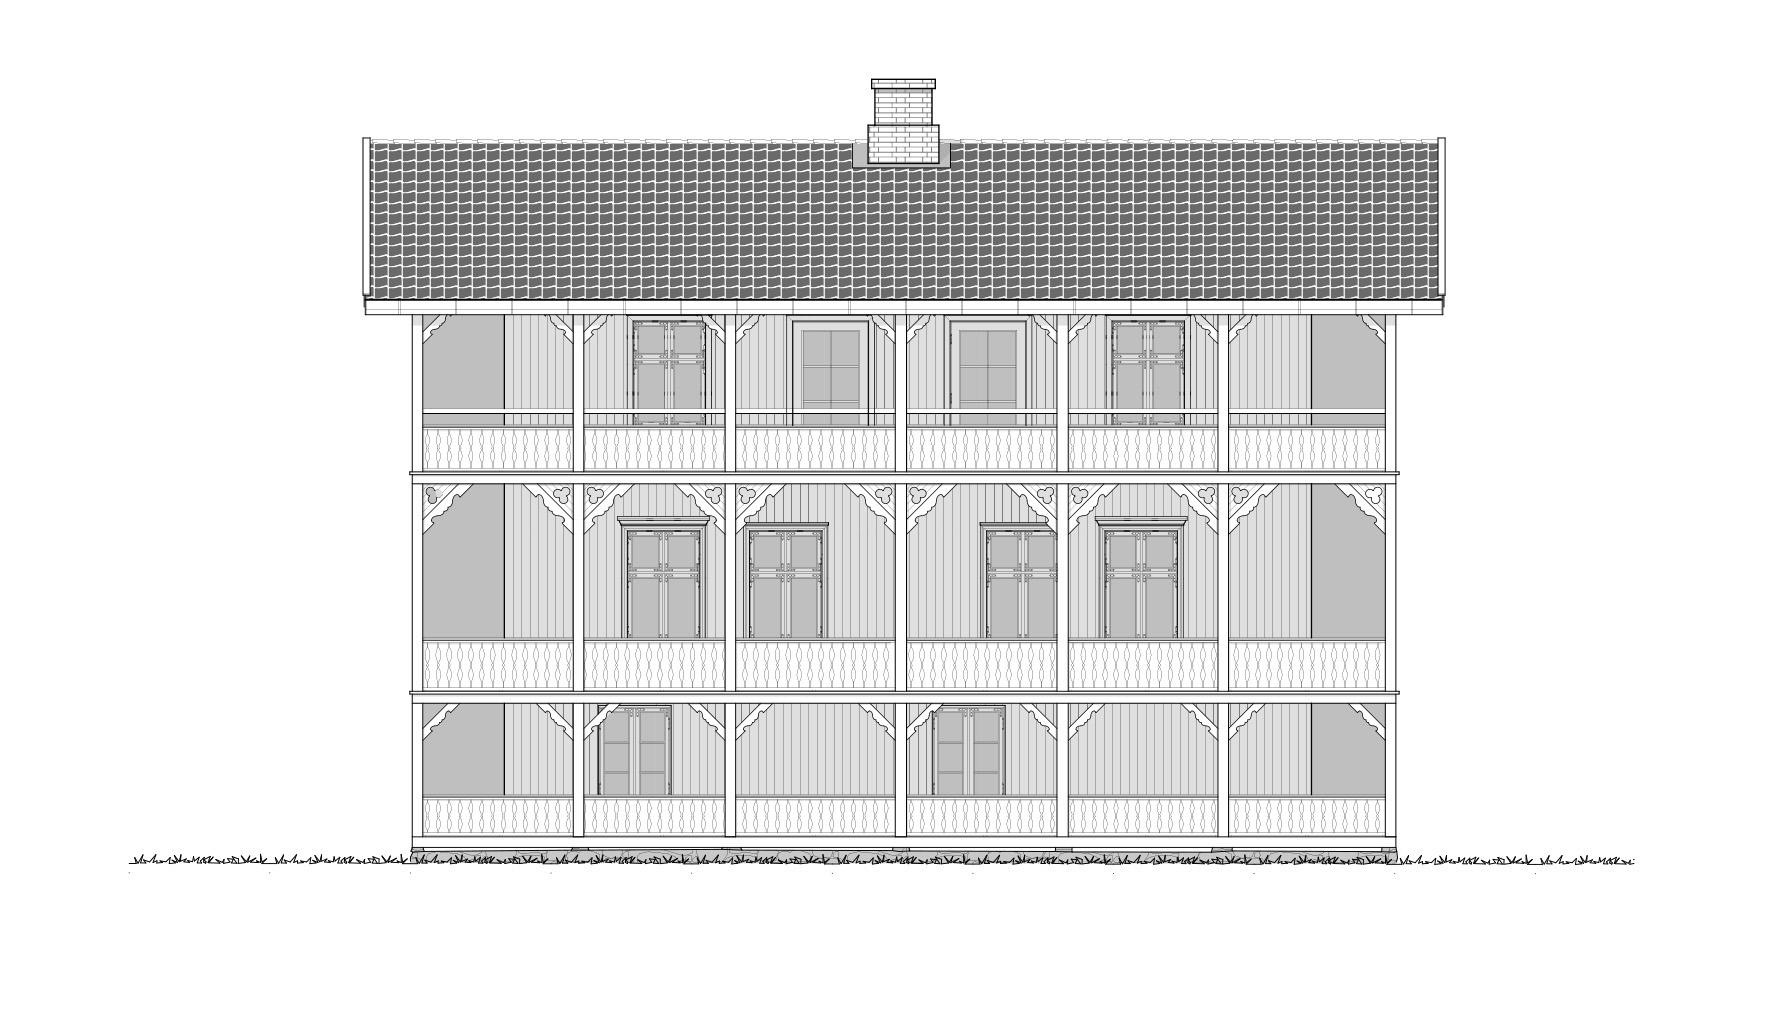 Gjestehuset fasade mot sjøen. Tegning: Atle J. Goutbeek